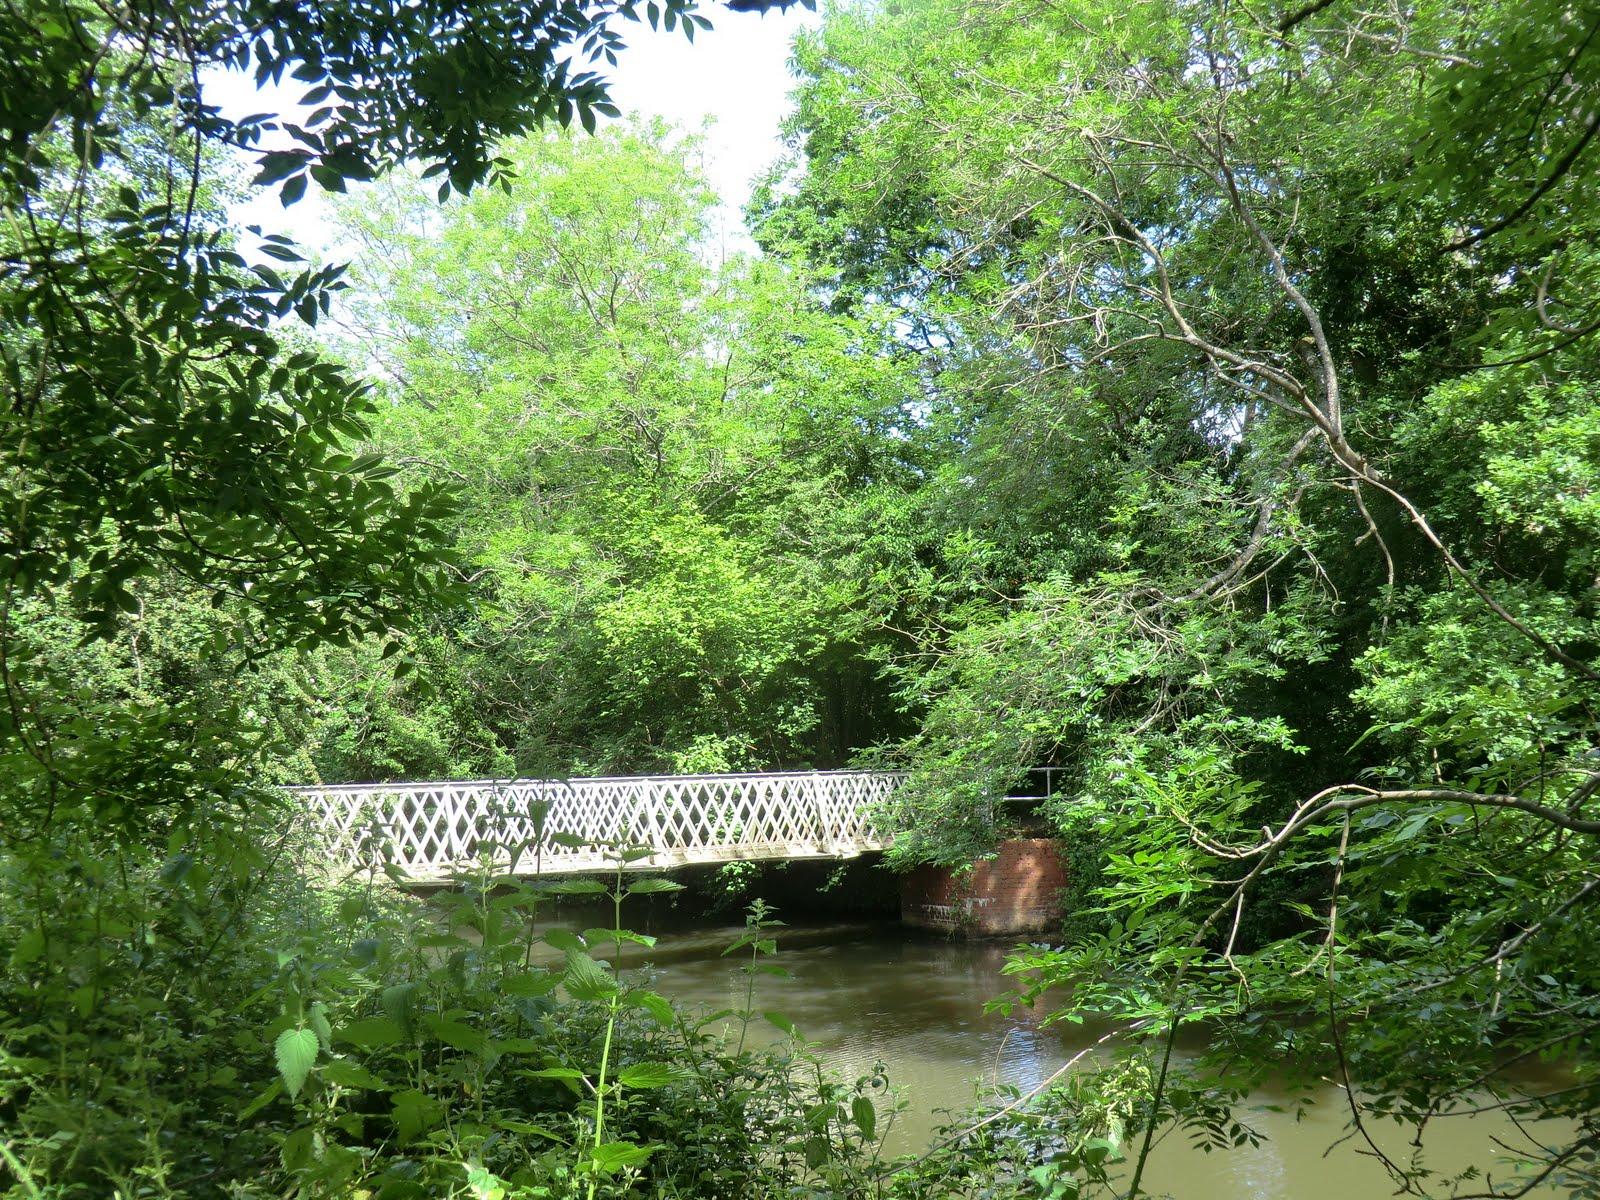 CIMG8598 Lucifer Bridge, Haysden Country Park